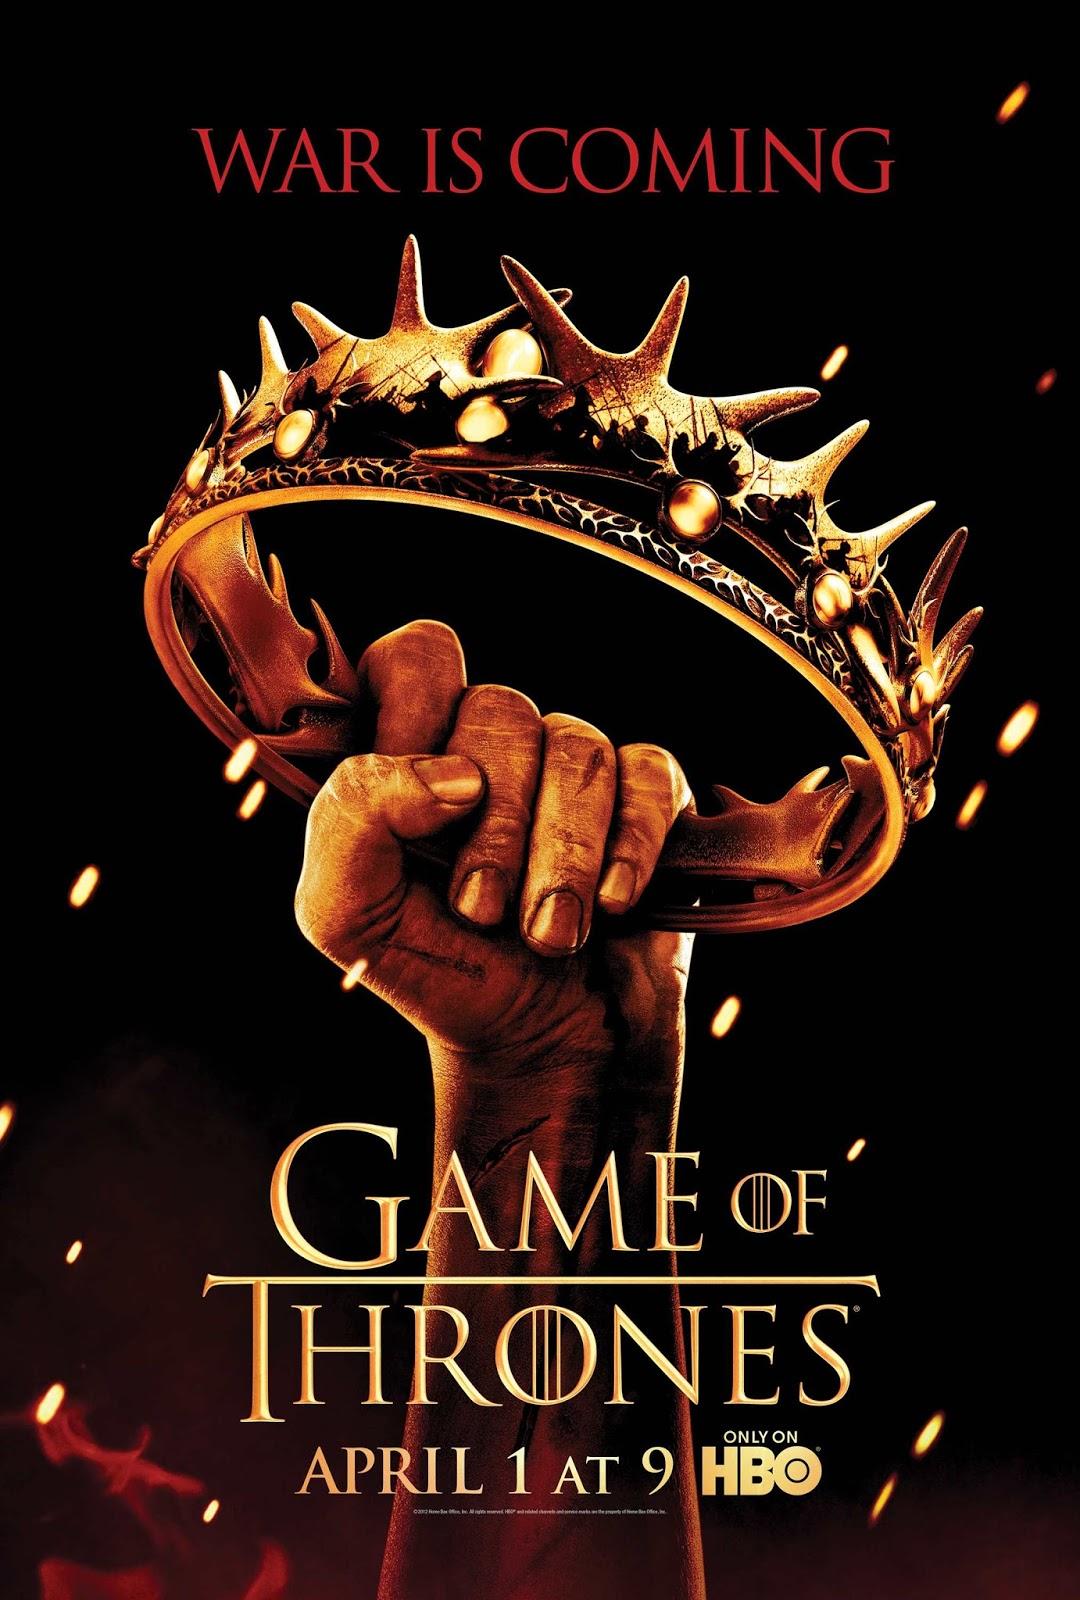 Game of Thrones SS02 ตอนที่ 1-10 ซับไทย/พากย์ไทย [จบ] HD